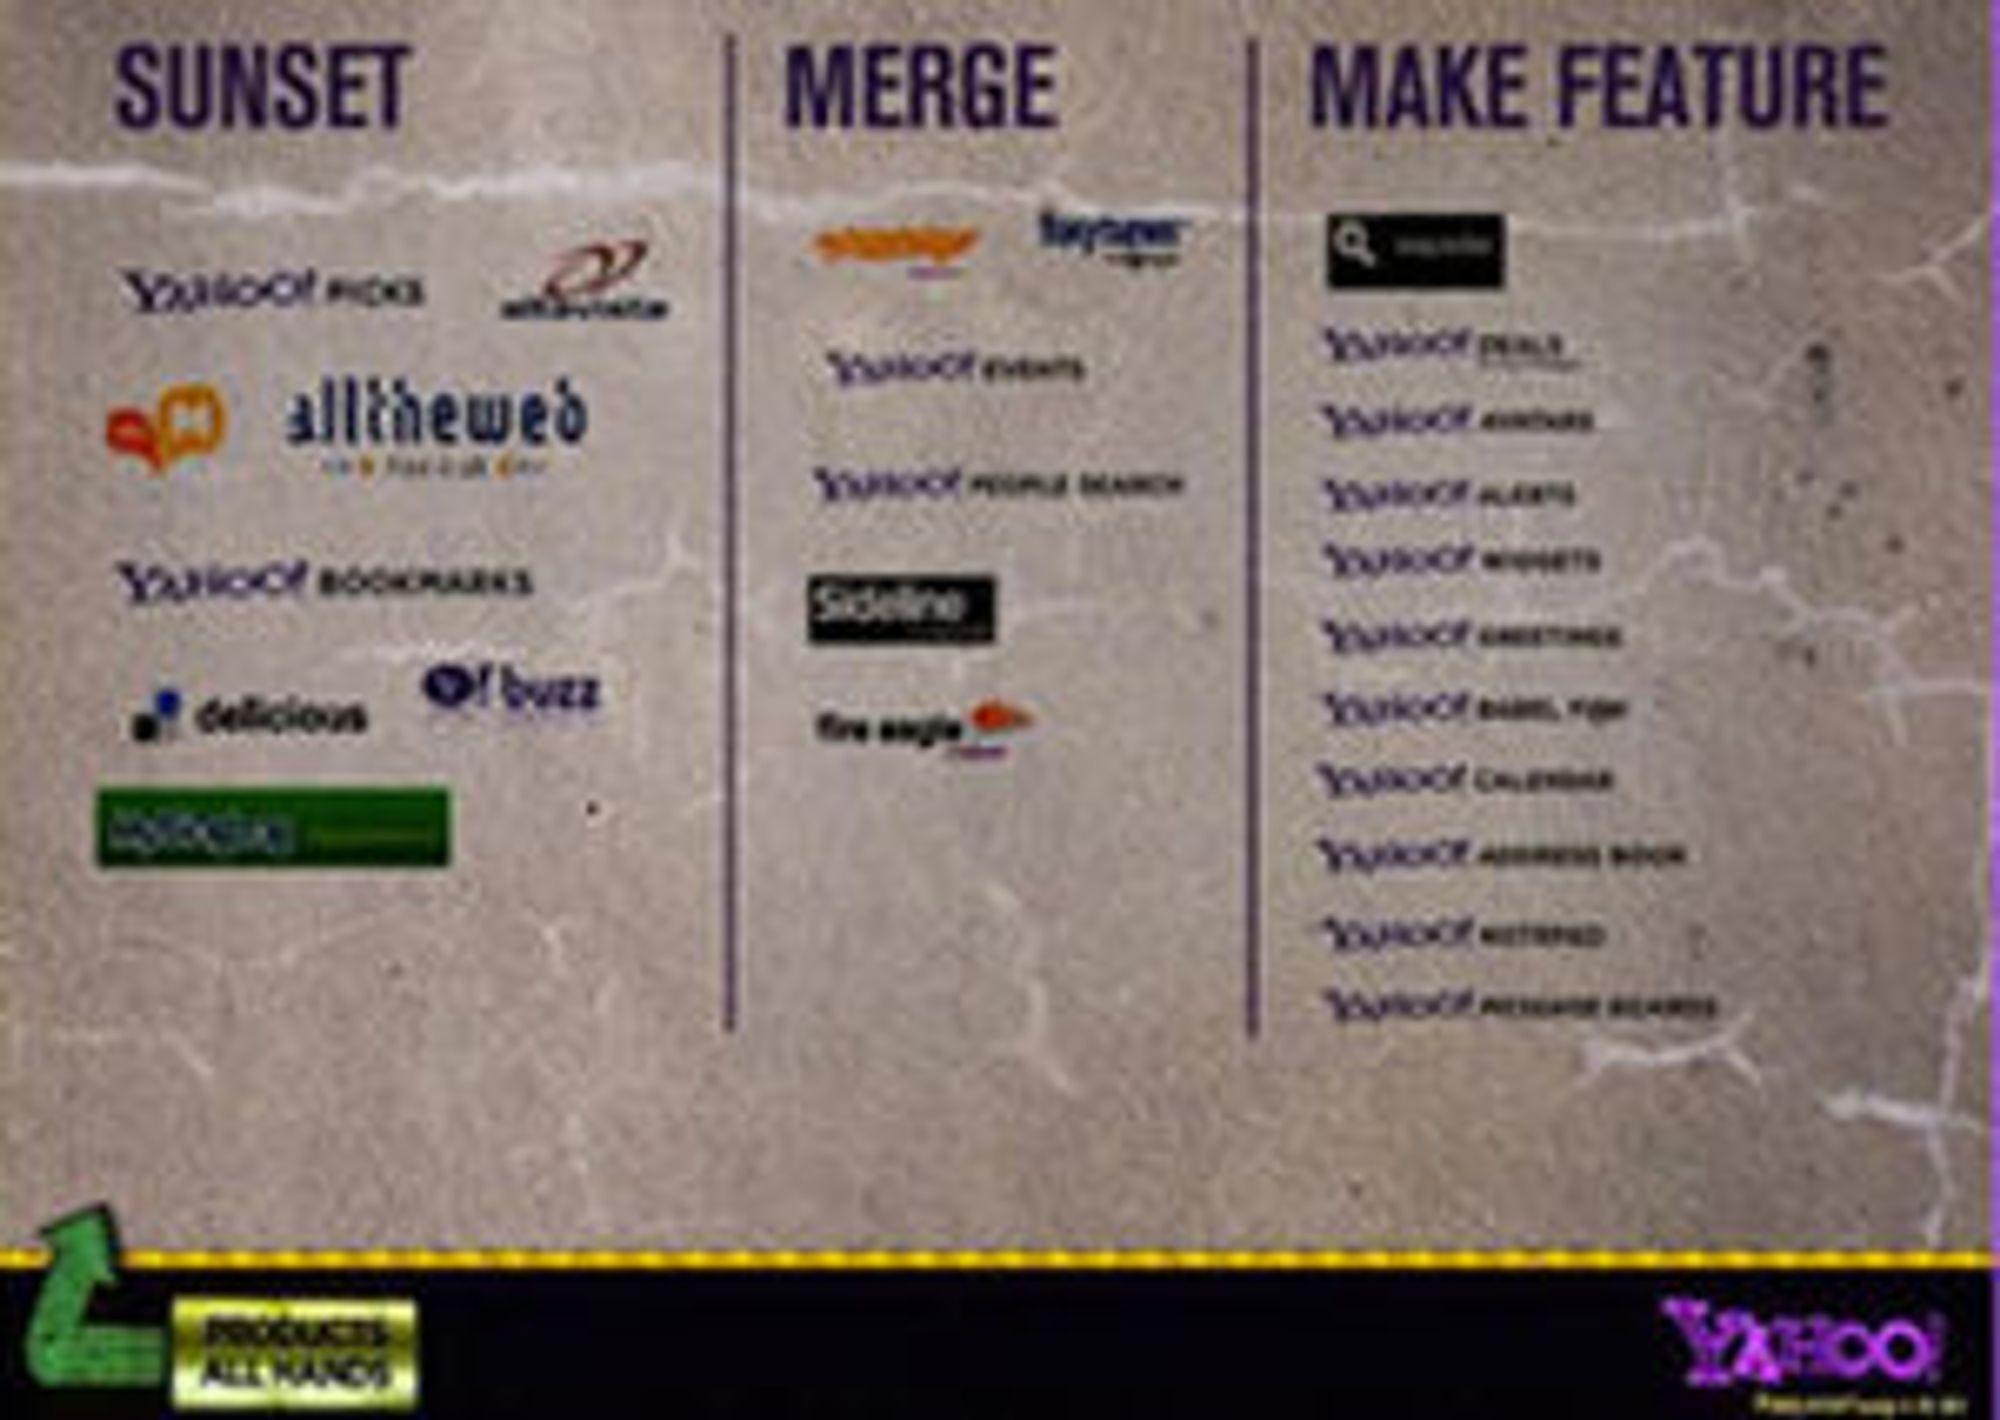 Lekkede kuttplaner: Alltheweb, Altavista, Delicious og fem andre Yahoo-tjenester legges ned.